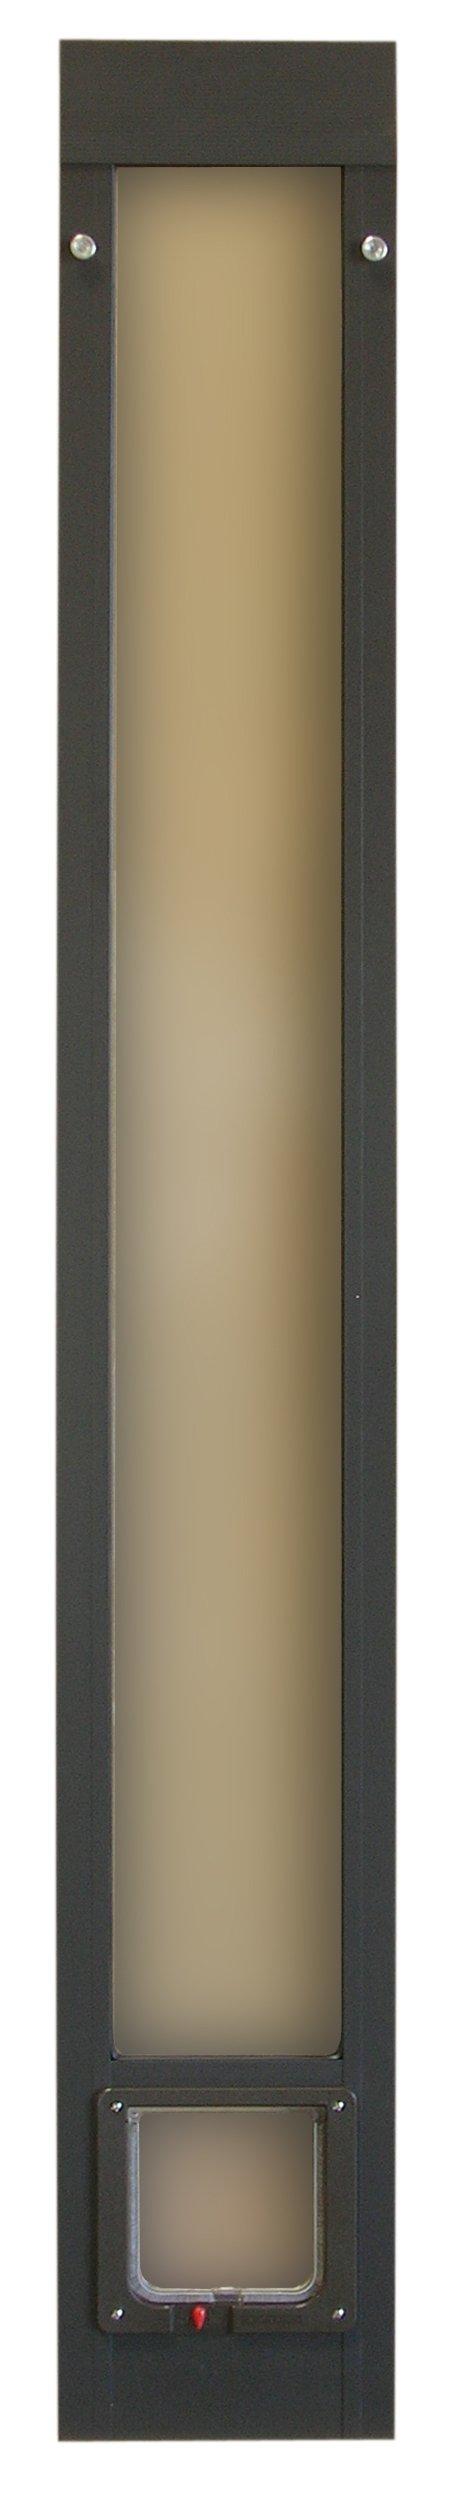 Ideal Pet Products Fast Fit Cat Flap Patio Door for Pets, Bronze